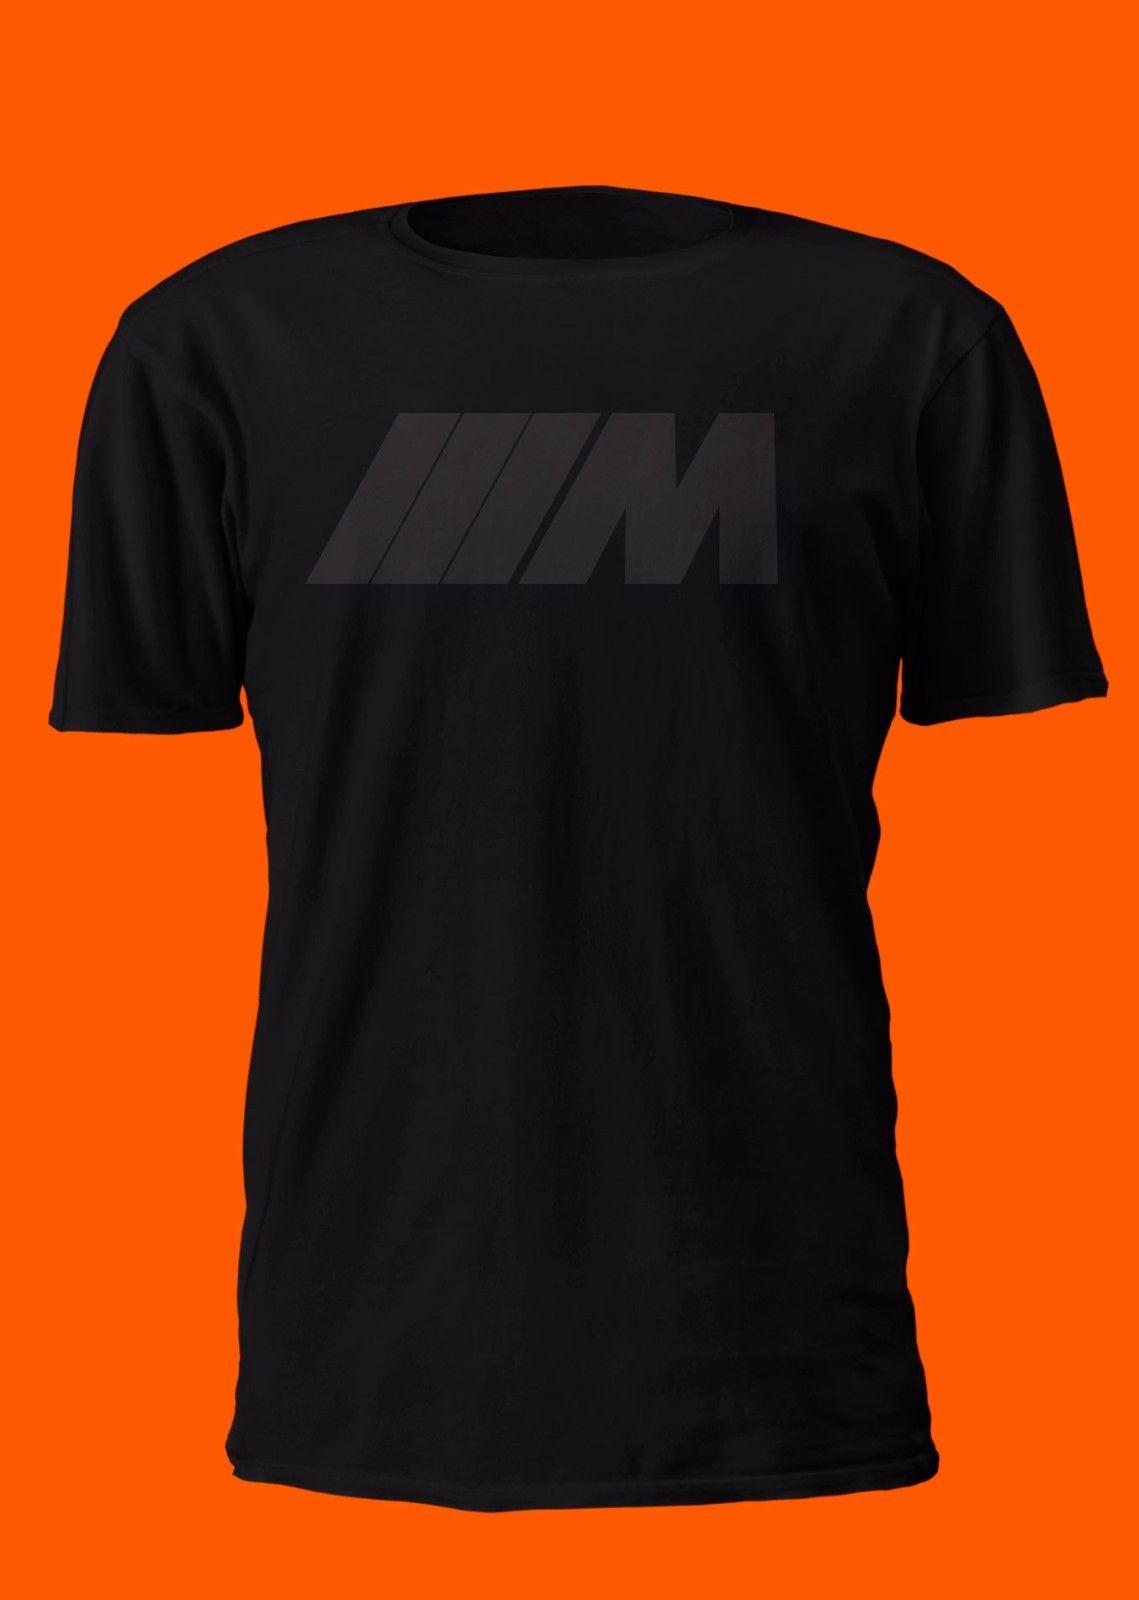 2019 Hot sale Fashion Car Racer Fans M BADGE SHIRT M3 M5 M6 EURO IMPORT GERMAN BIMMER T-SHIRT S M L XL 2XL Tee shirt